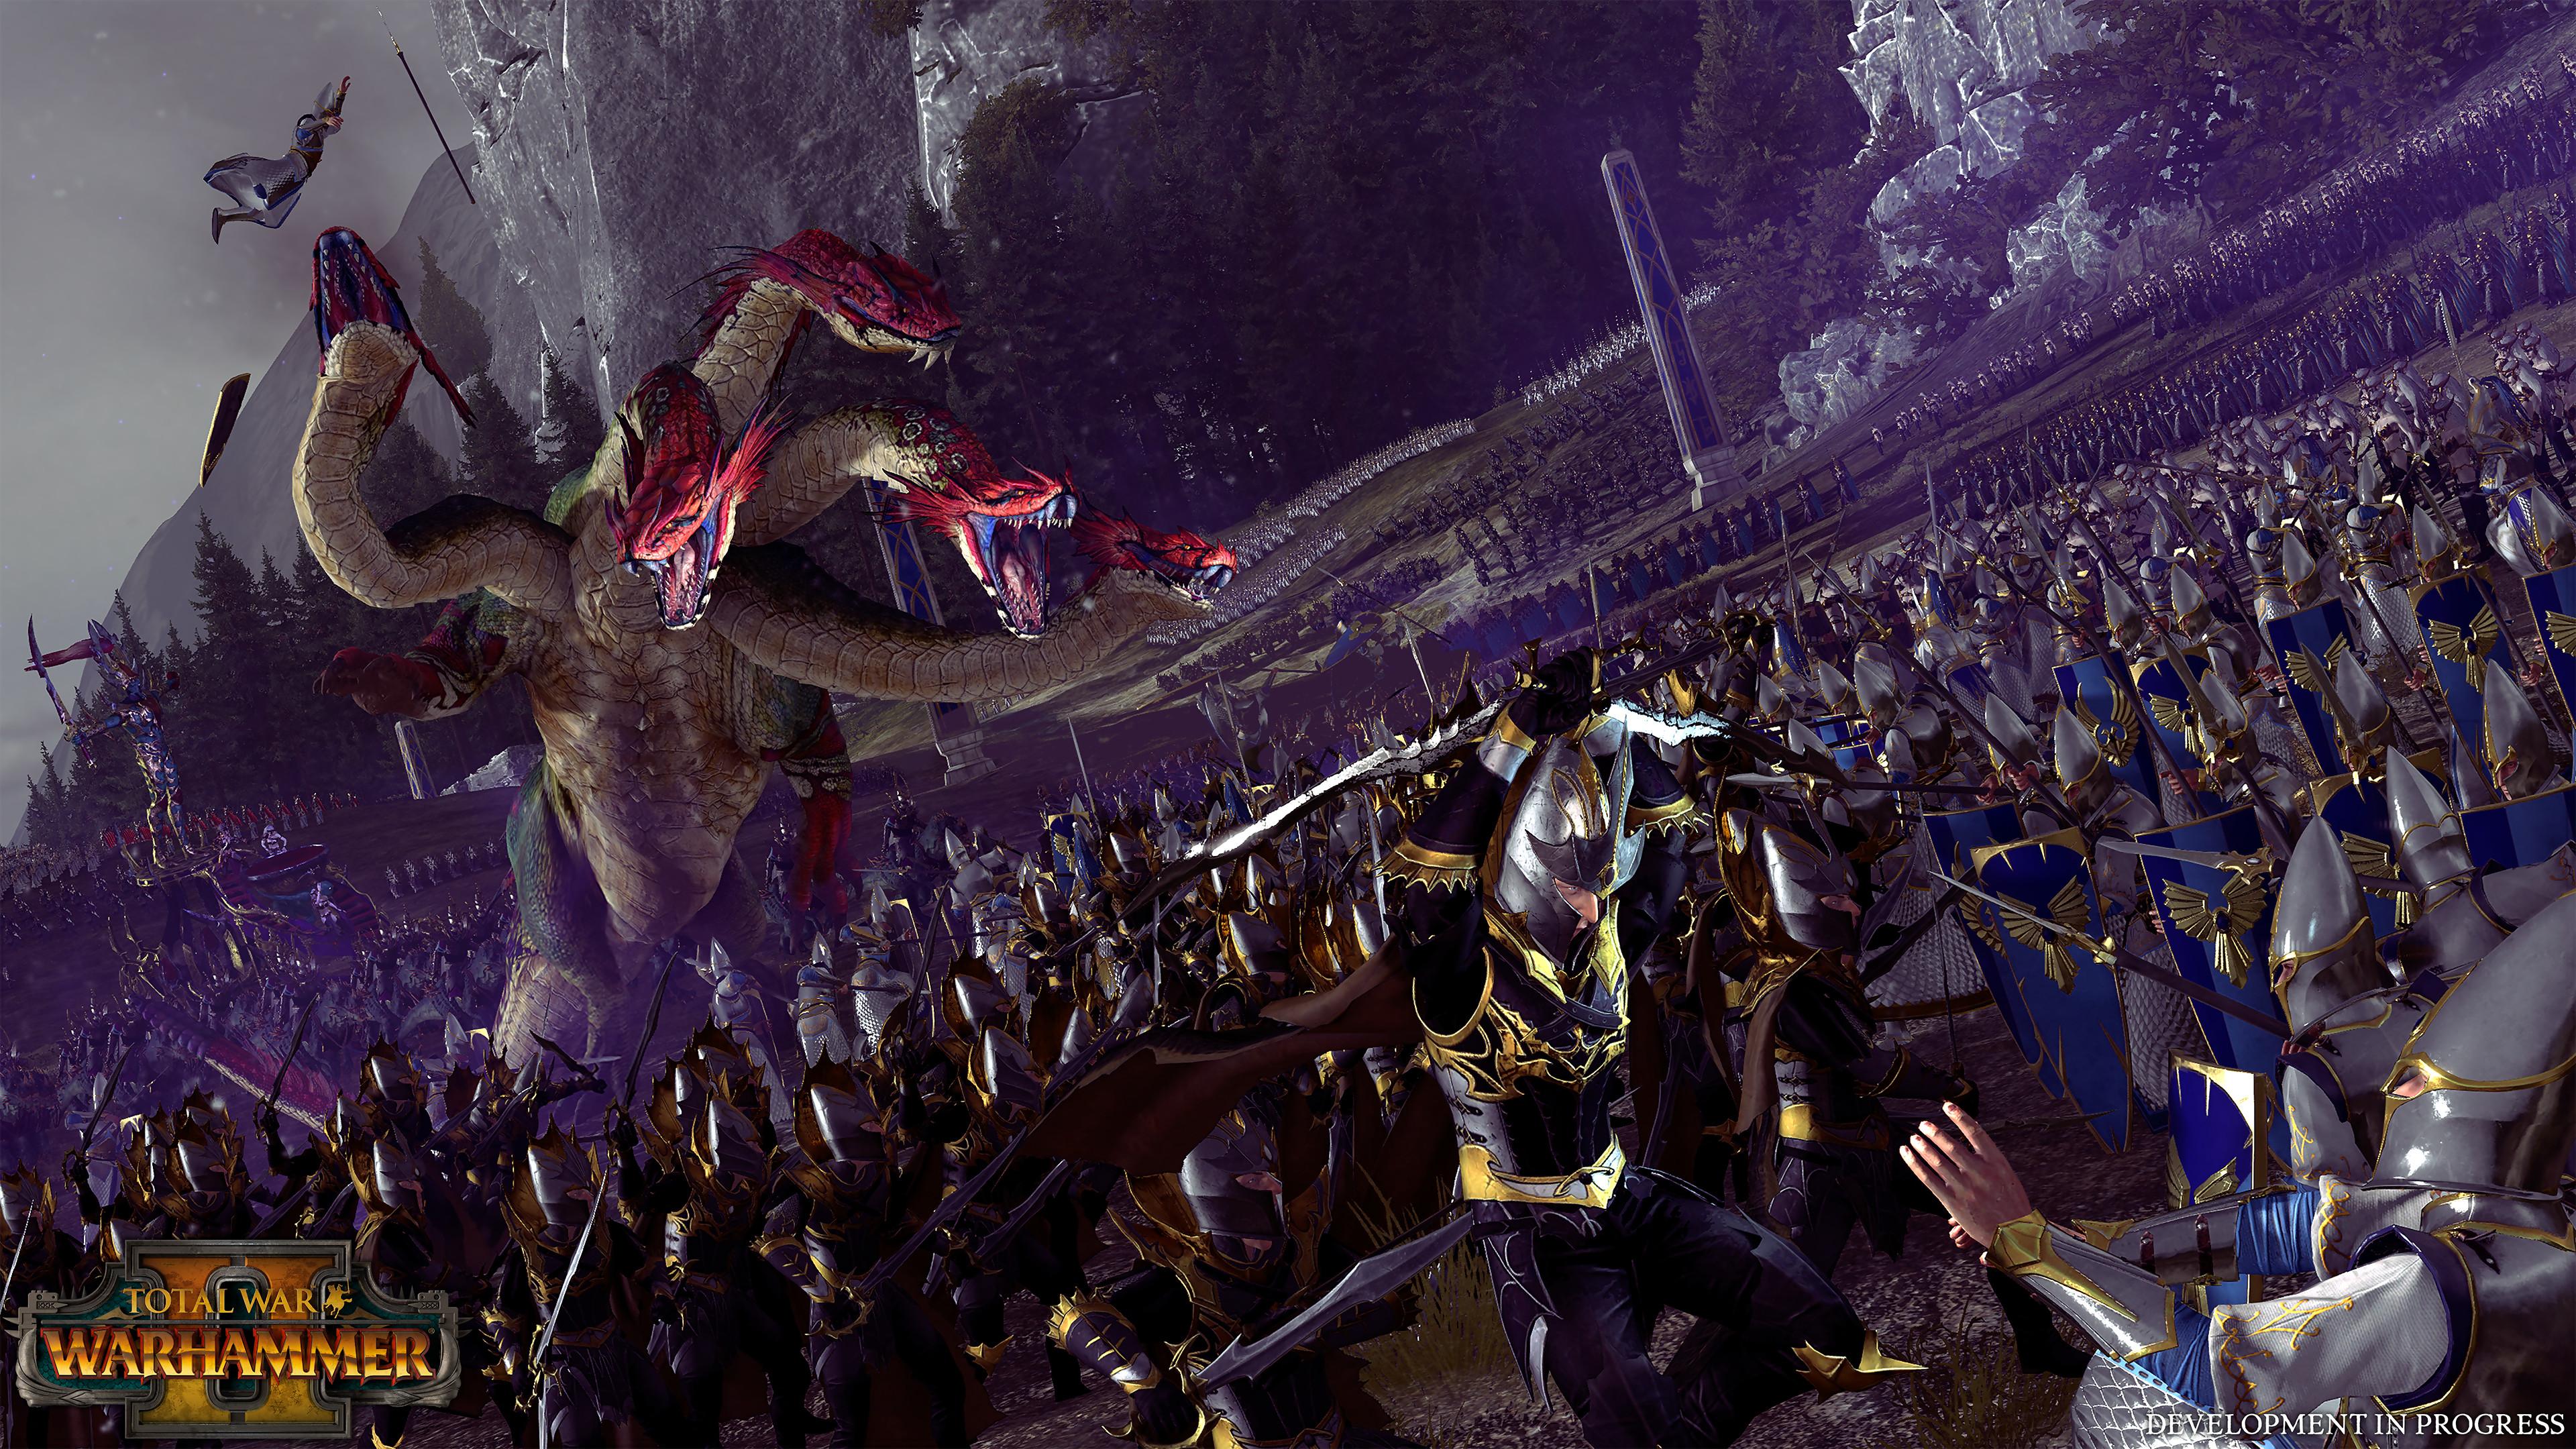 Total War Warhammer 2 Les Elfes Noirs Pr 233 Sent 233 S En Vid 233 O